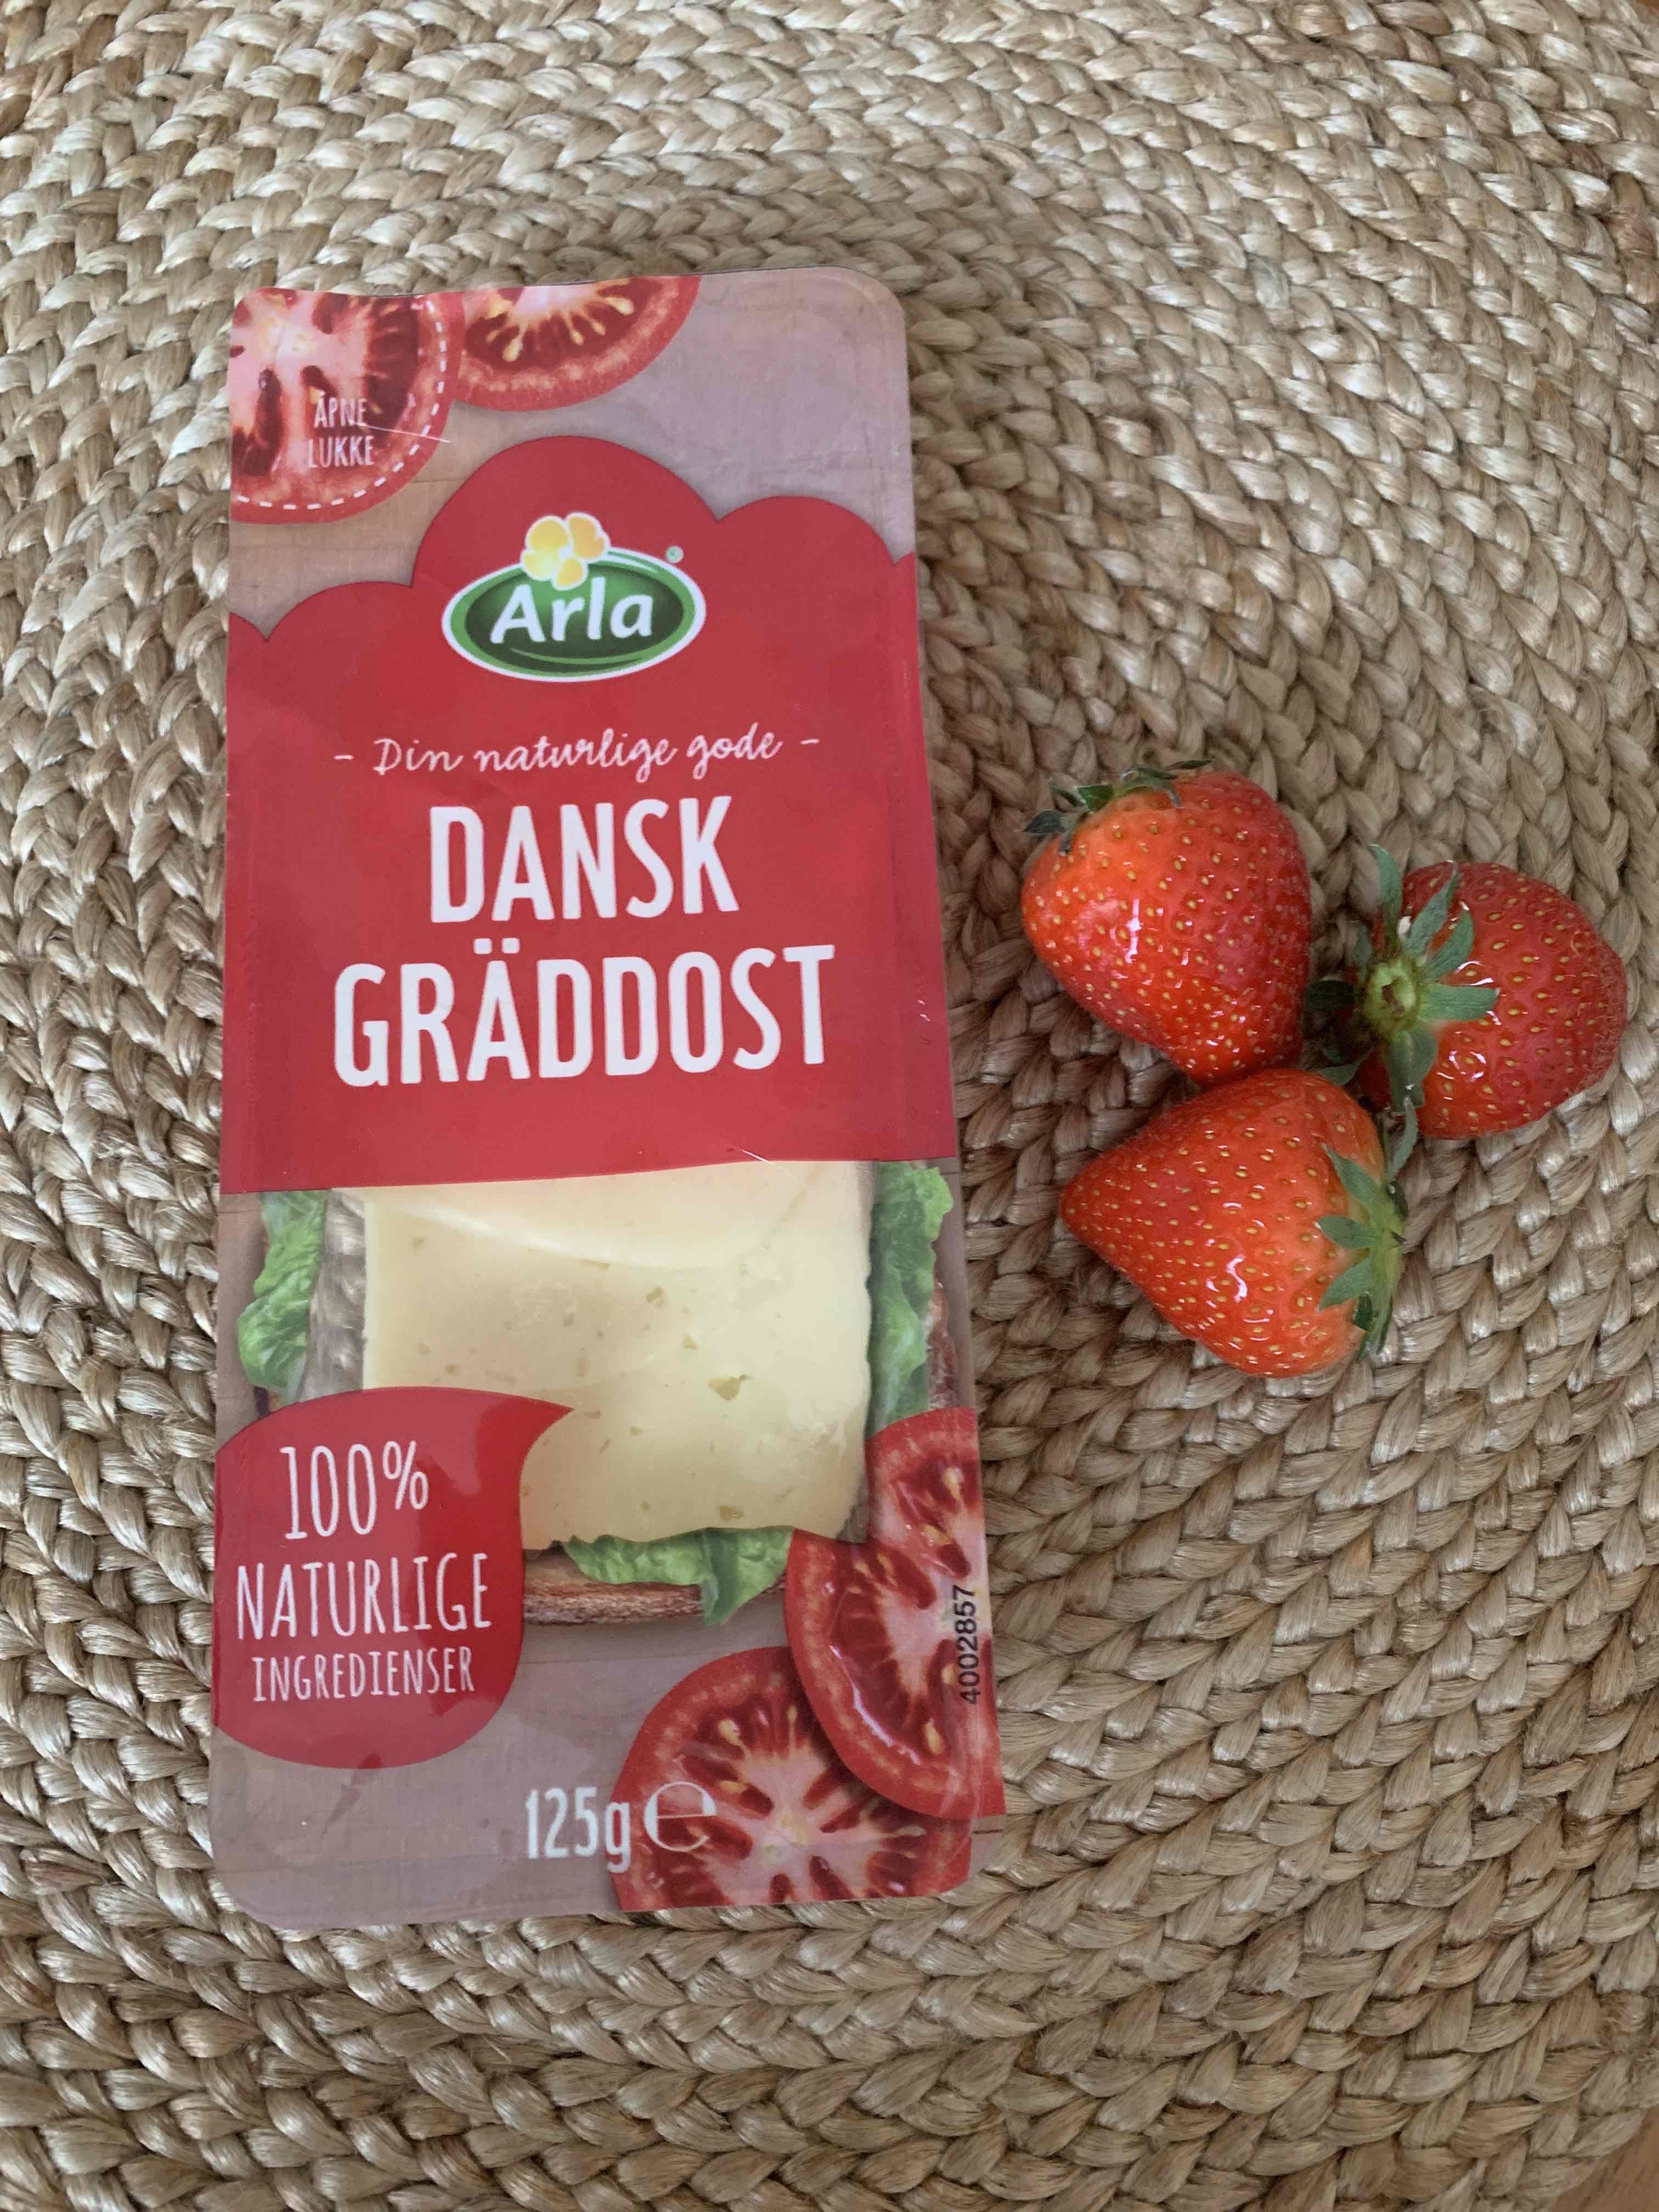 Dansk Gräddost